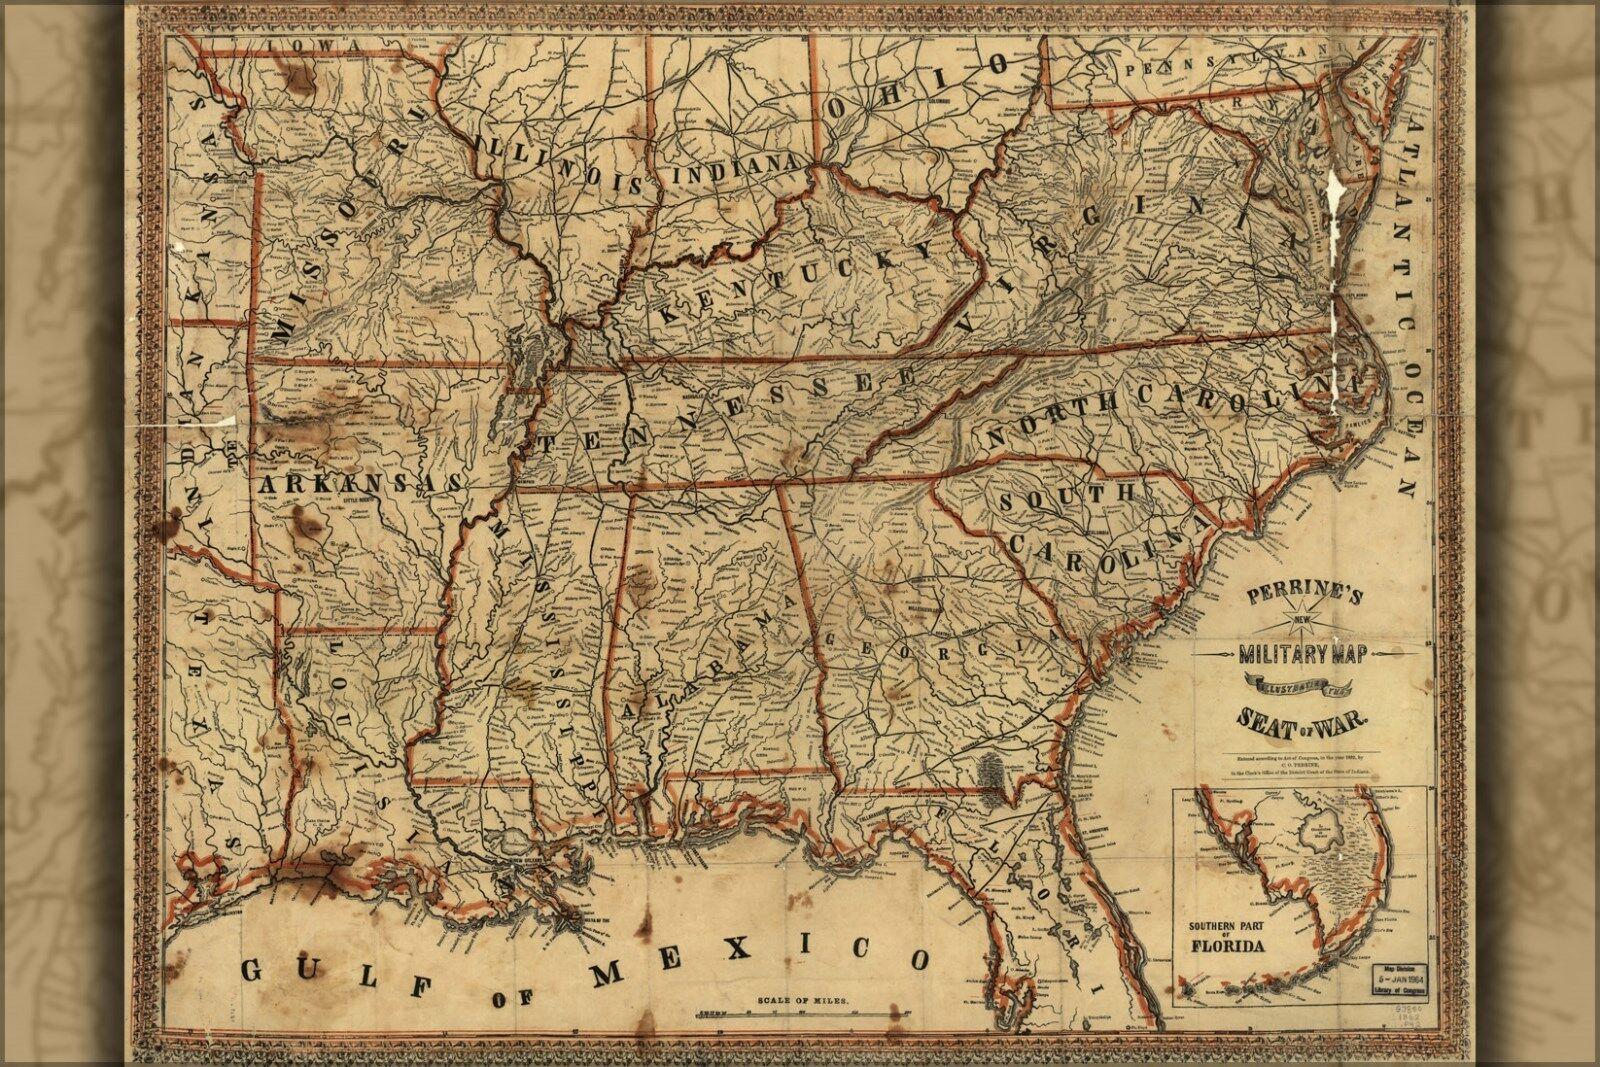 Plakat, Viele Größen; Karte Showing Seat Of Krieg Süd U.S.1862